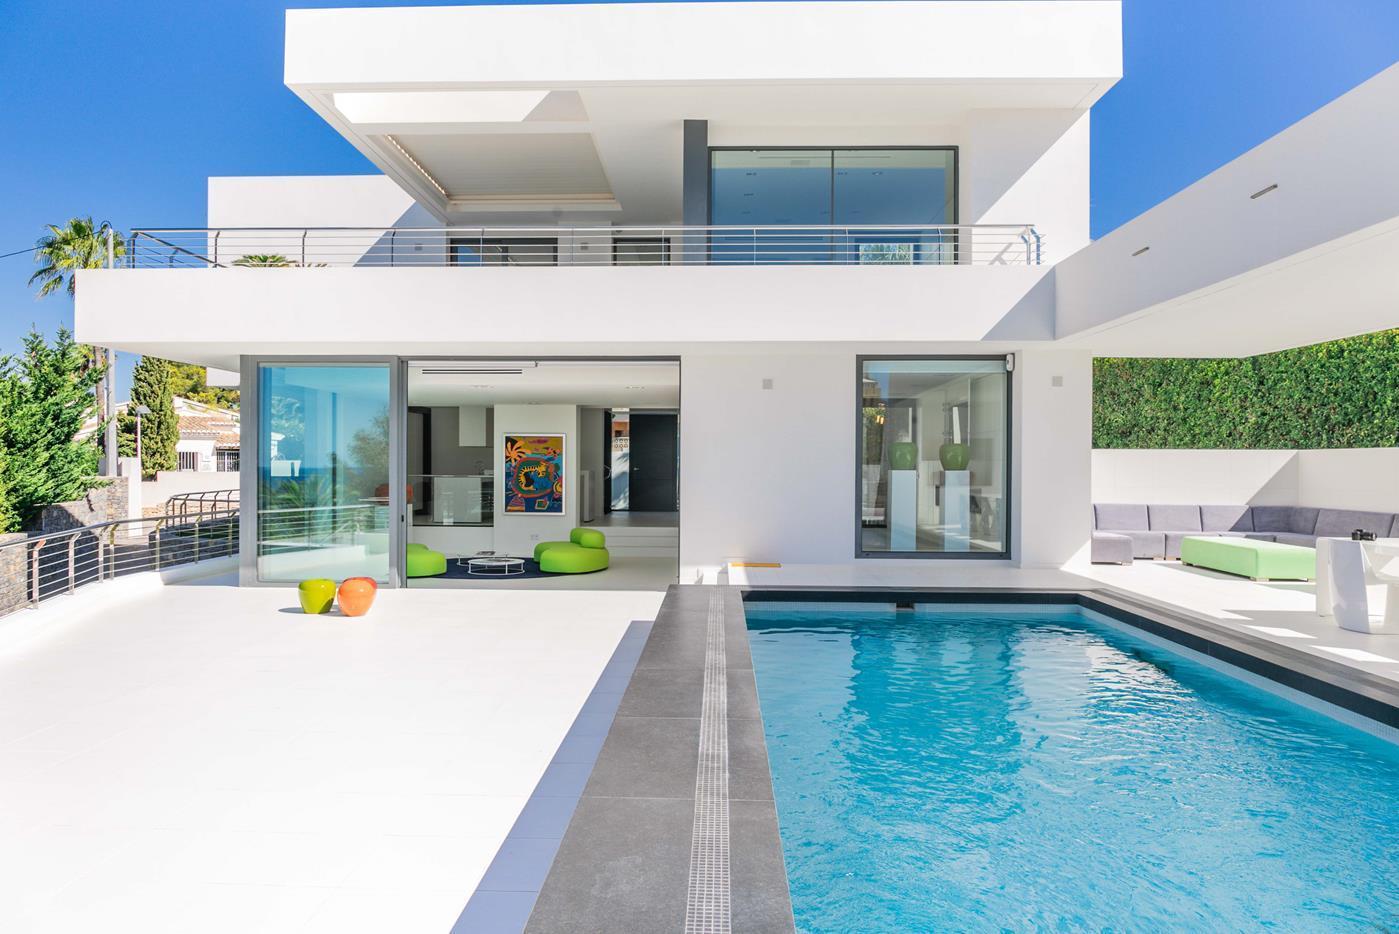 luxevilla en moraira ·  3999995€